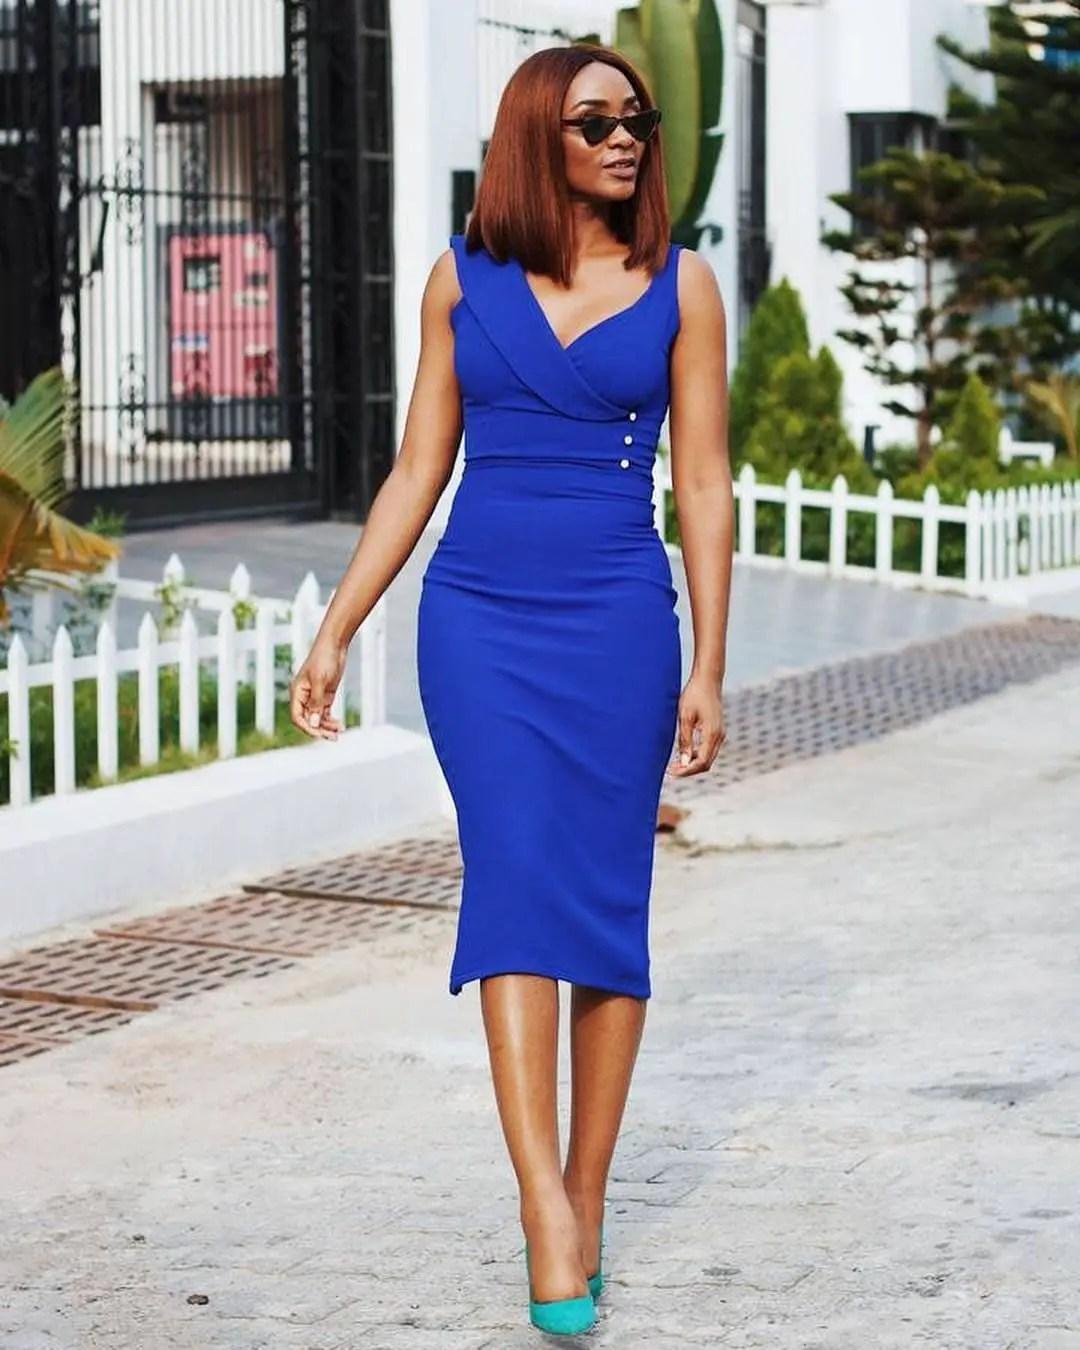 Enjoy These 10 Female Corporate Styles Inspiration